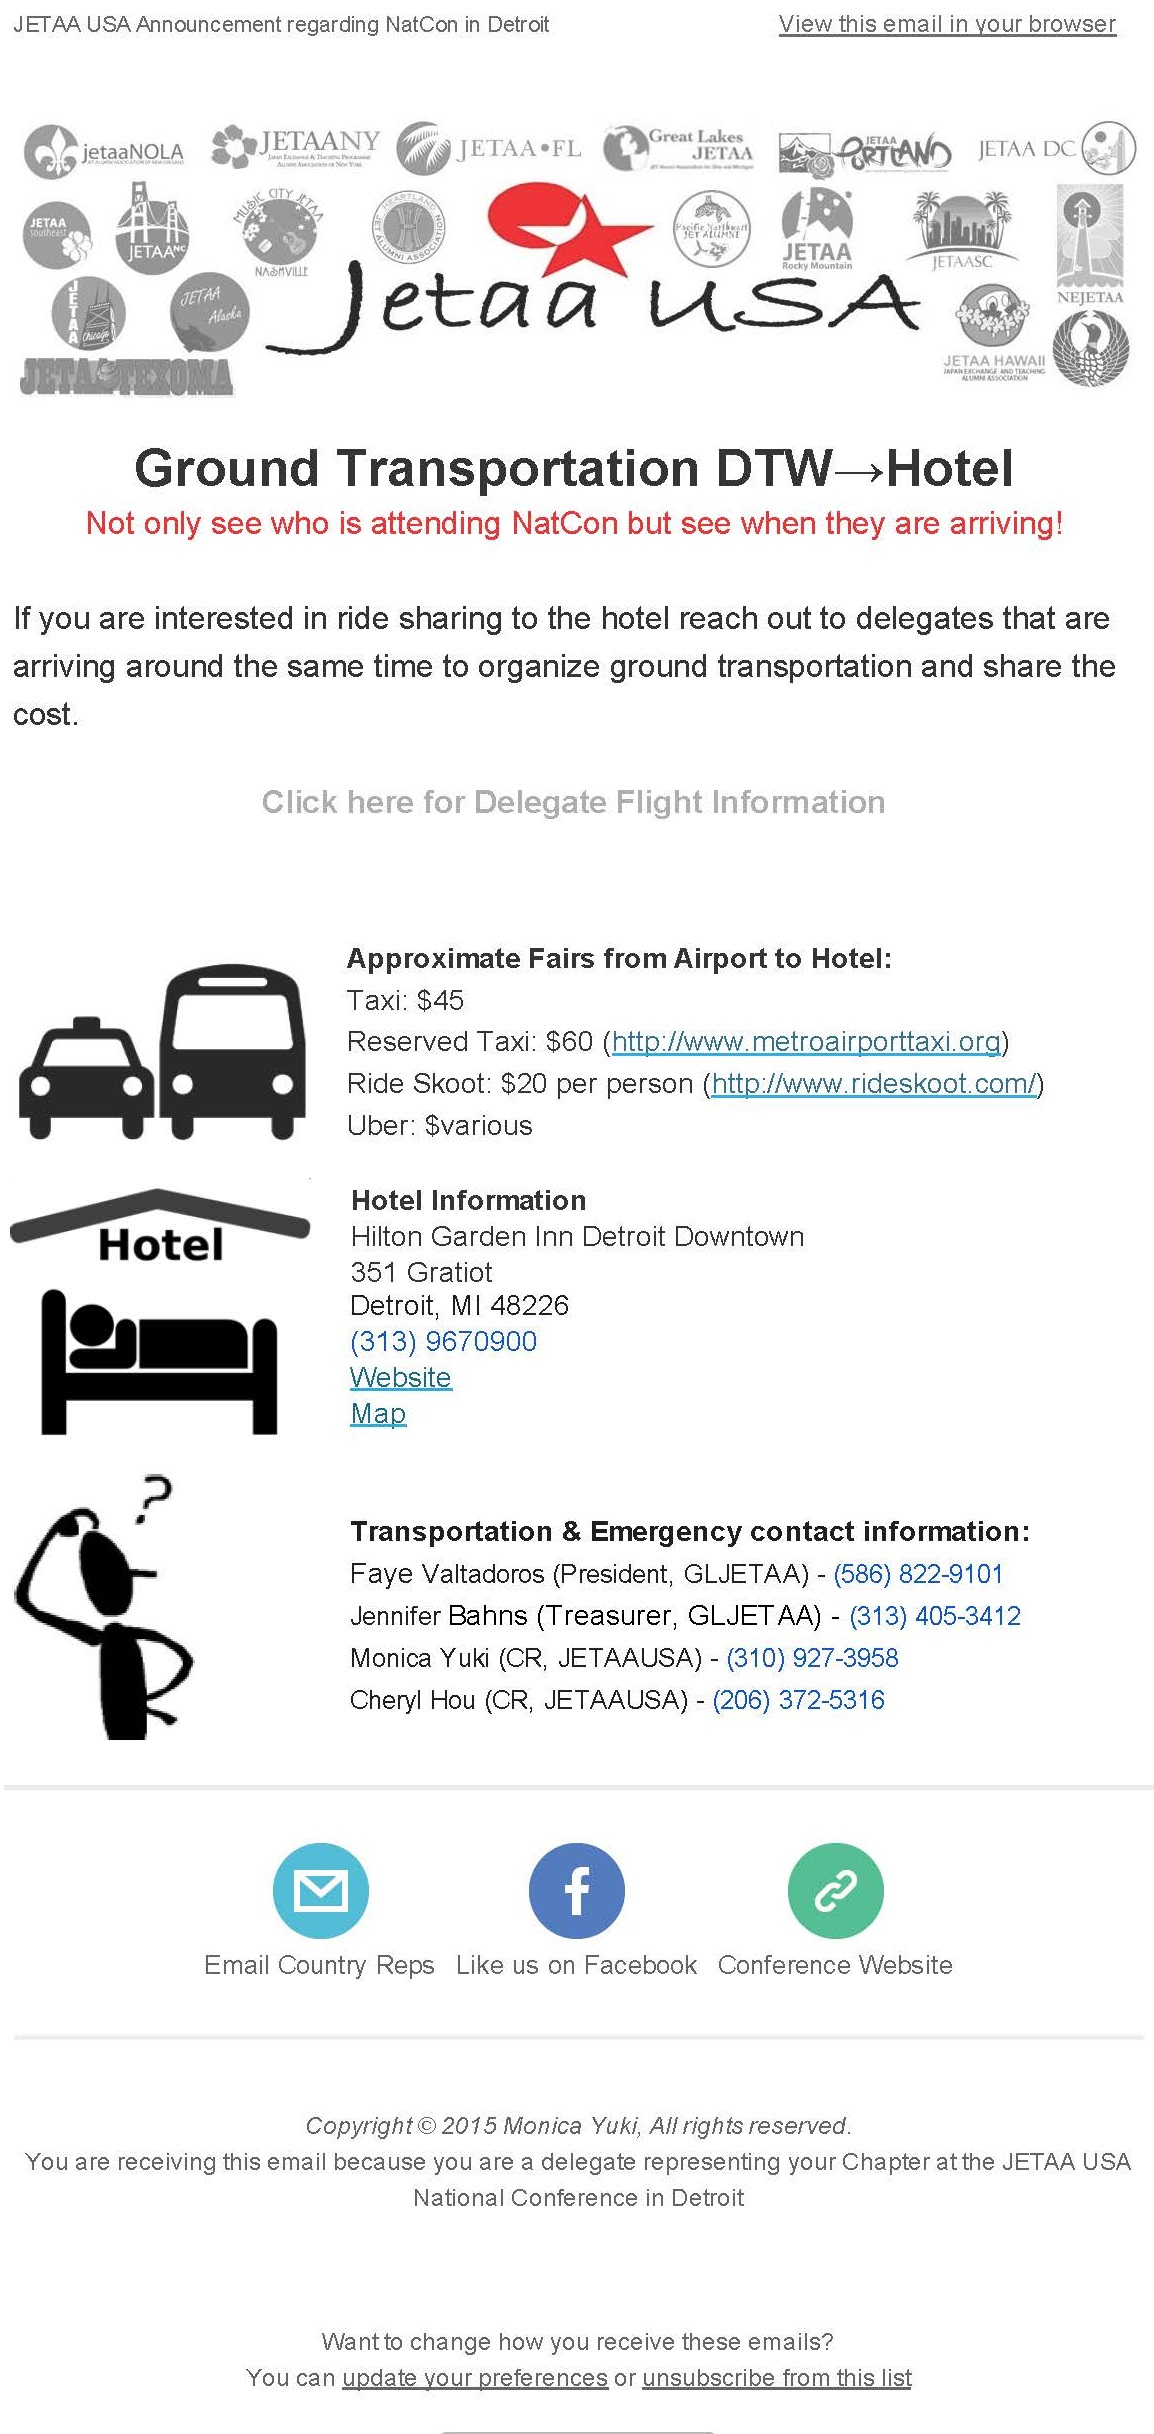 NatCon Ground Transportation Ride Share Coordination